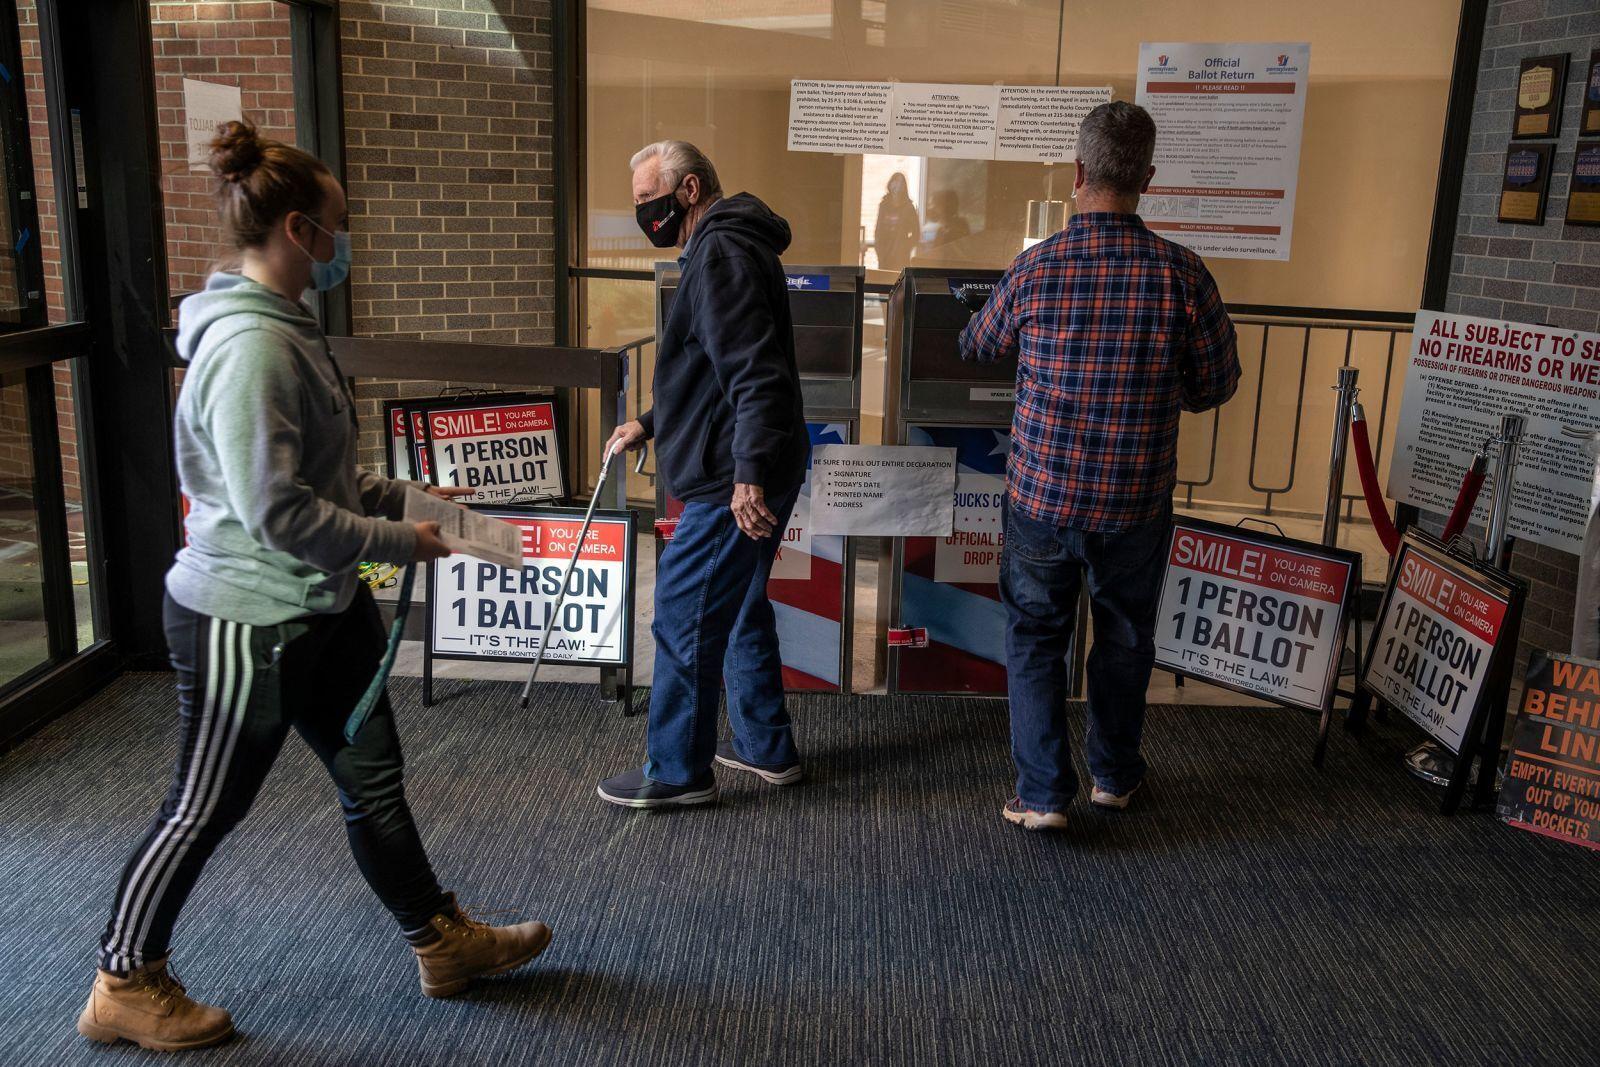 Избиратели оставляют свои бюллетени в урне в Дойлстауни, штат Пенсильвания